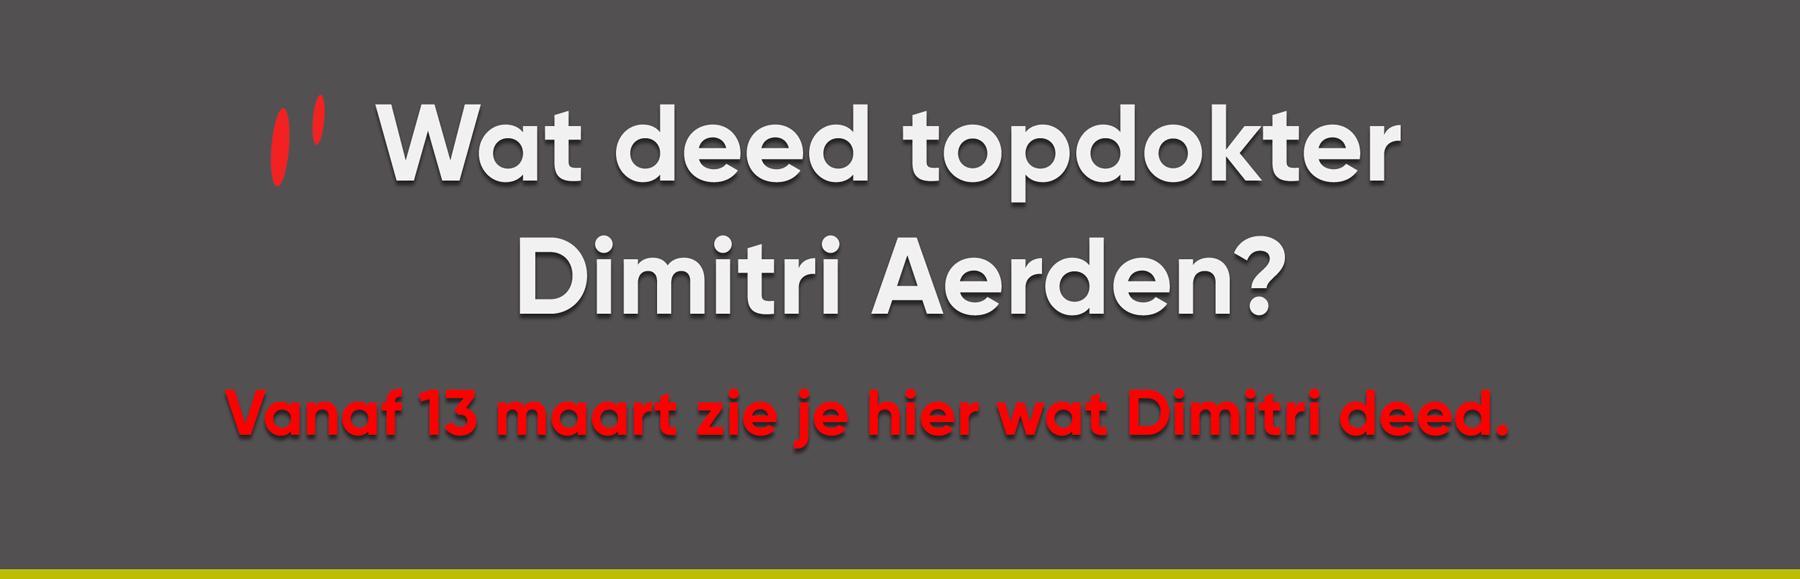 Wat deed topdokter Dimitri Aerden? Vanaf 13 maart zie je hier wat Dimitri deed.